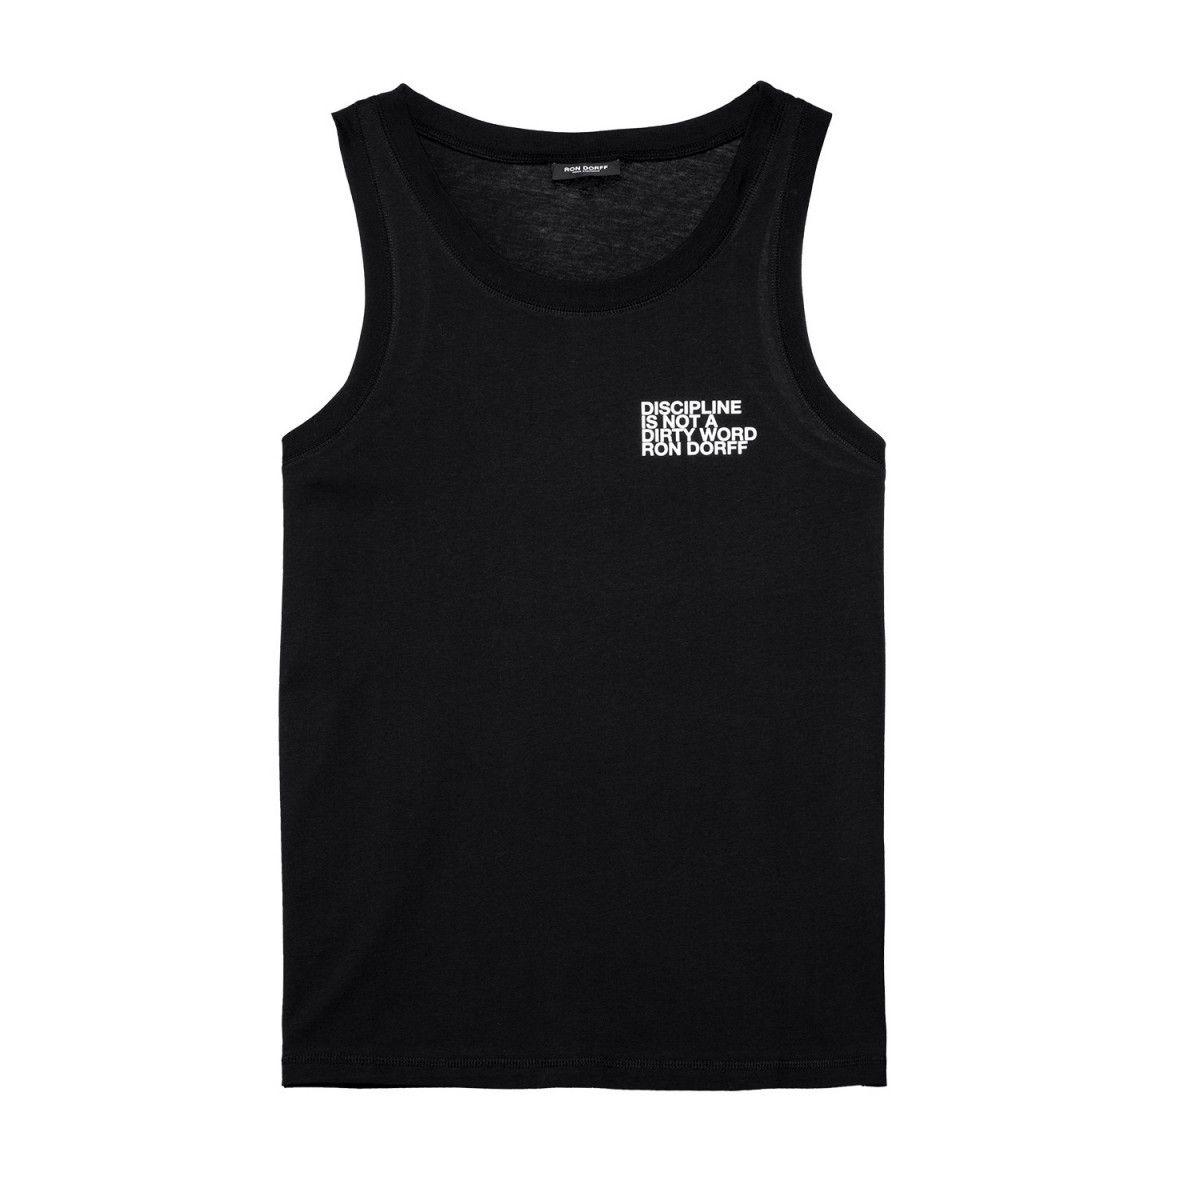 T-shirt de fitness/training TANK TOP DISCIPLINE SMALL PRINT